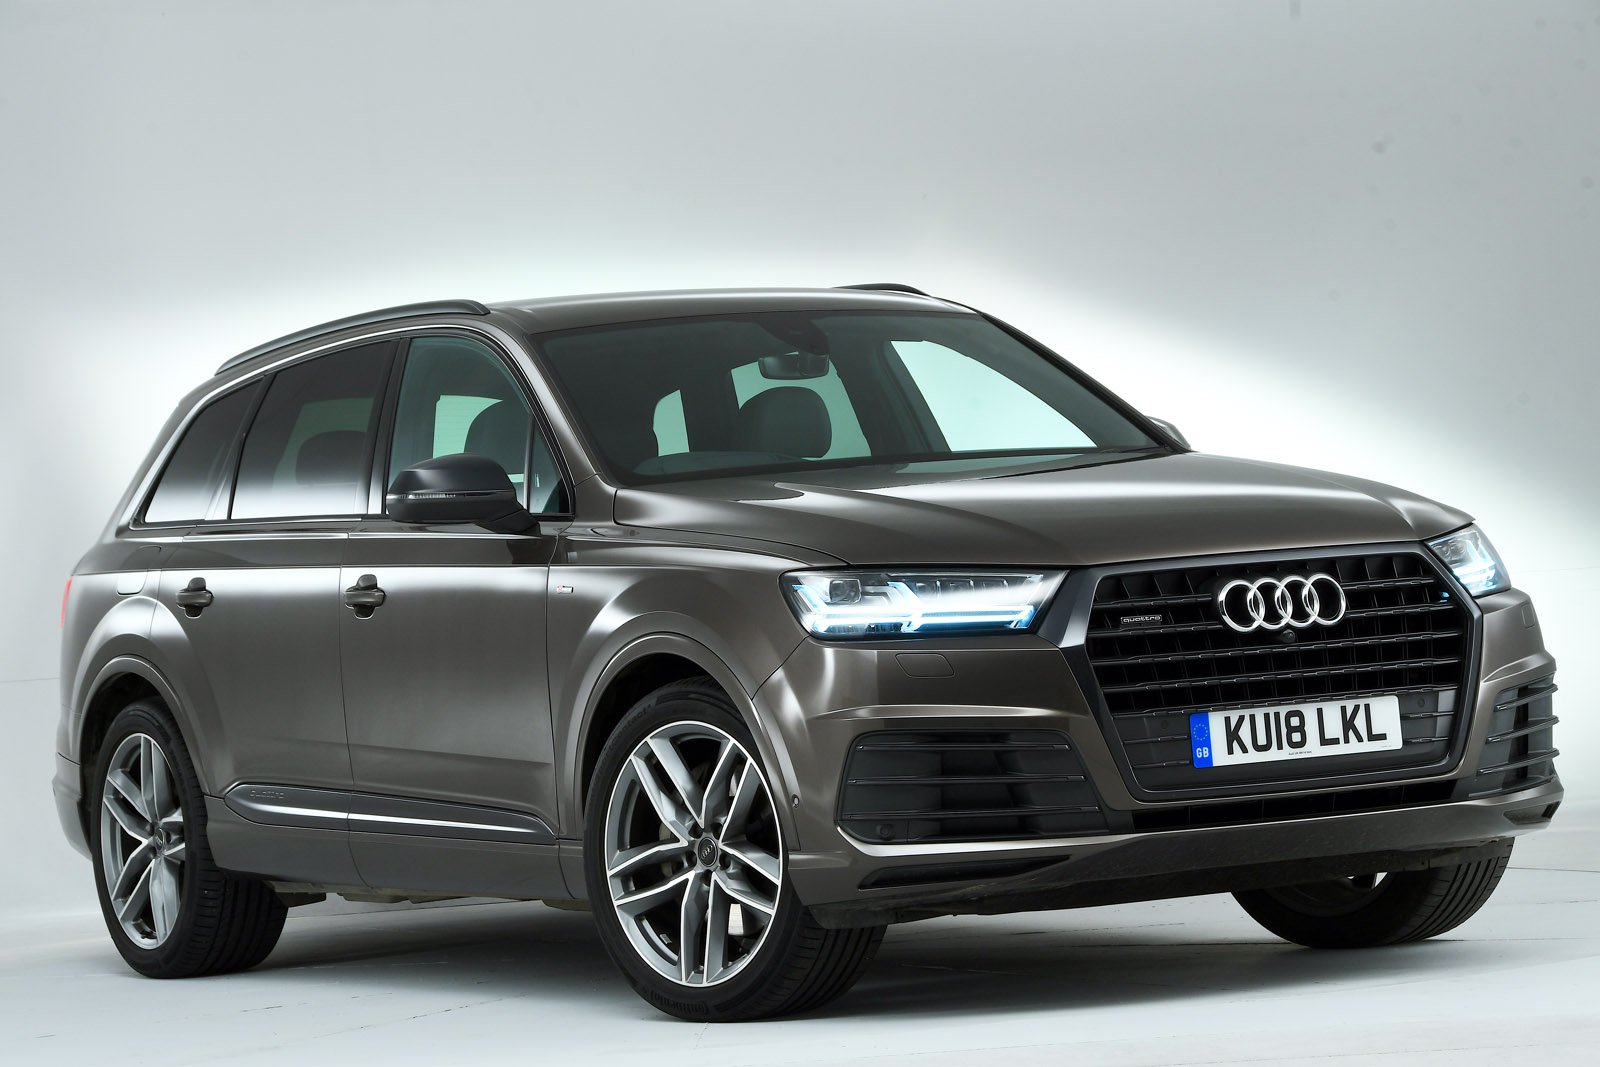 Audi Q7 front - studio shot